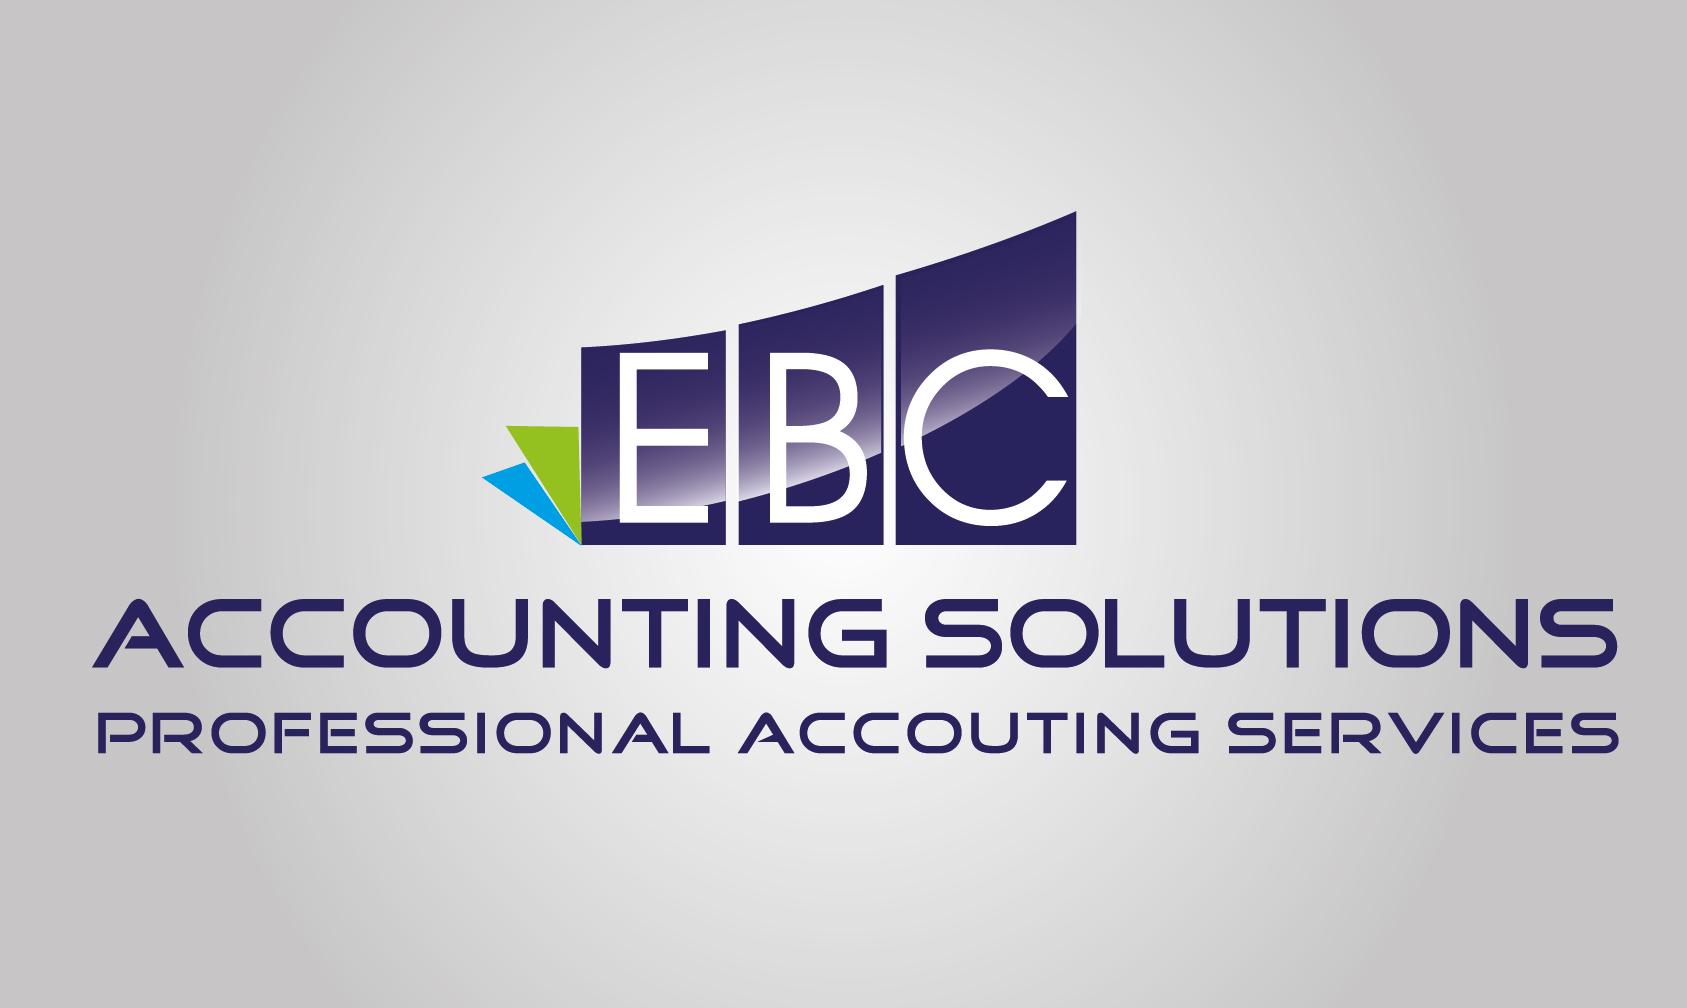 Logo Design by VENTSISLAV KOVACHEV - Entry No. 19 in the Logo Design Contest New Logo Design for EBC Accounting Solutions.